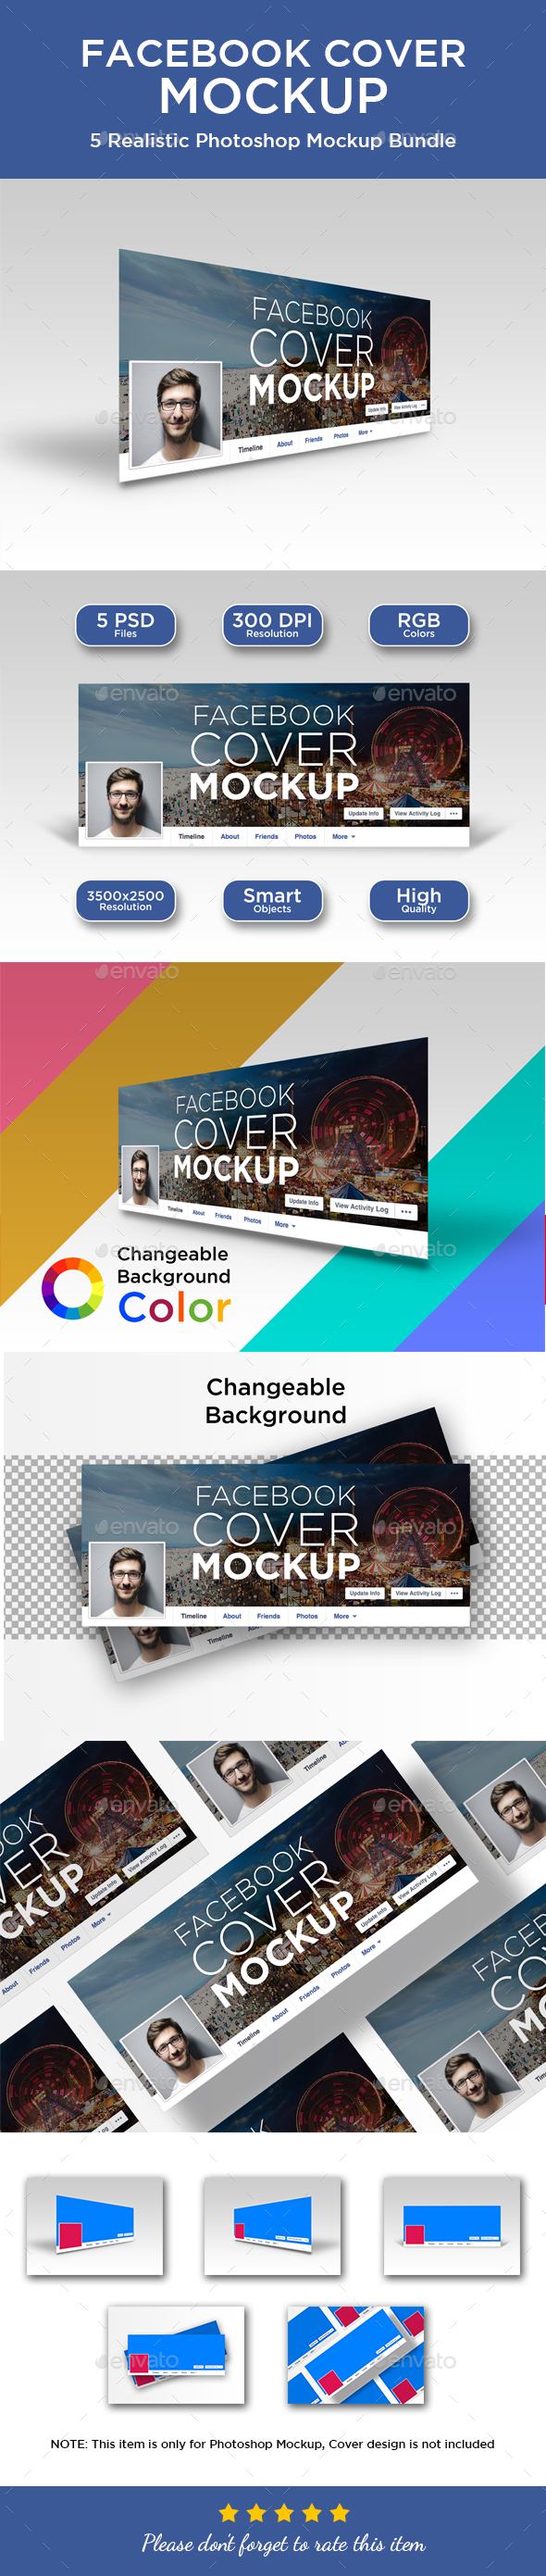 Facebook Cover Mockup Graphics, Designs & Templates